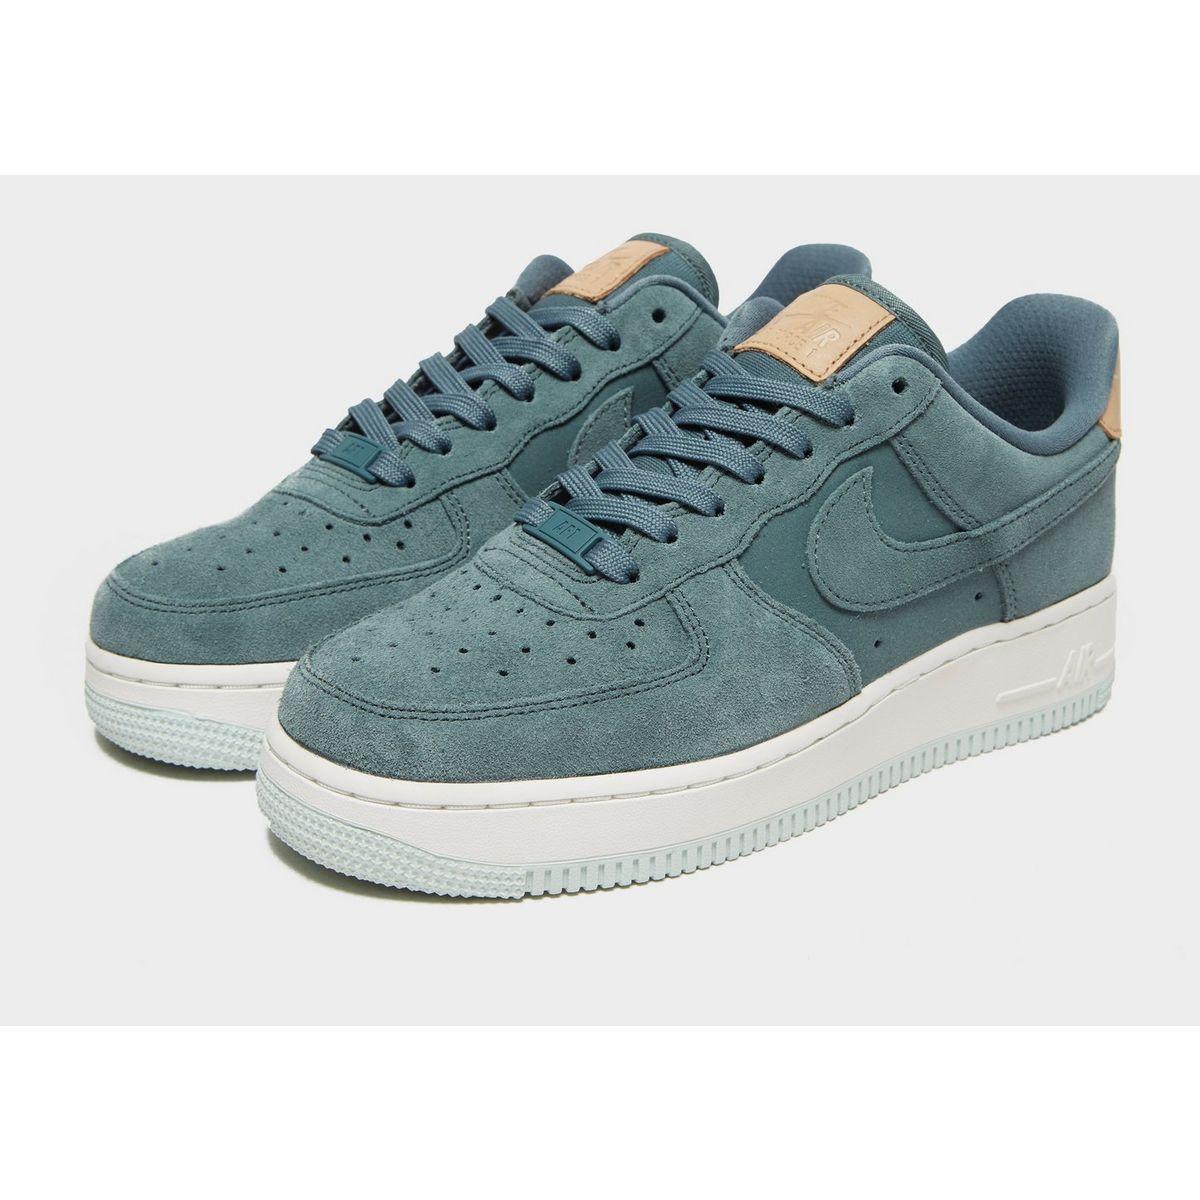 Nike Air Force 1 Premium Women's Παπούτσια nike